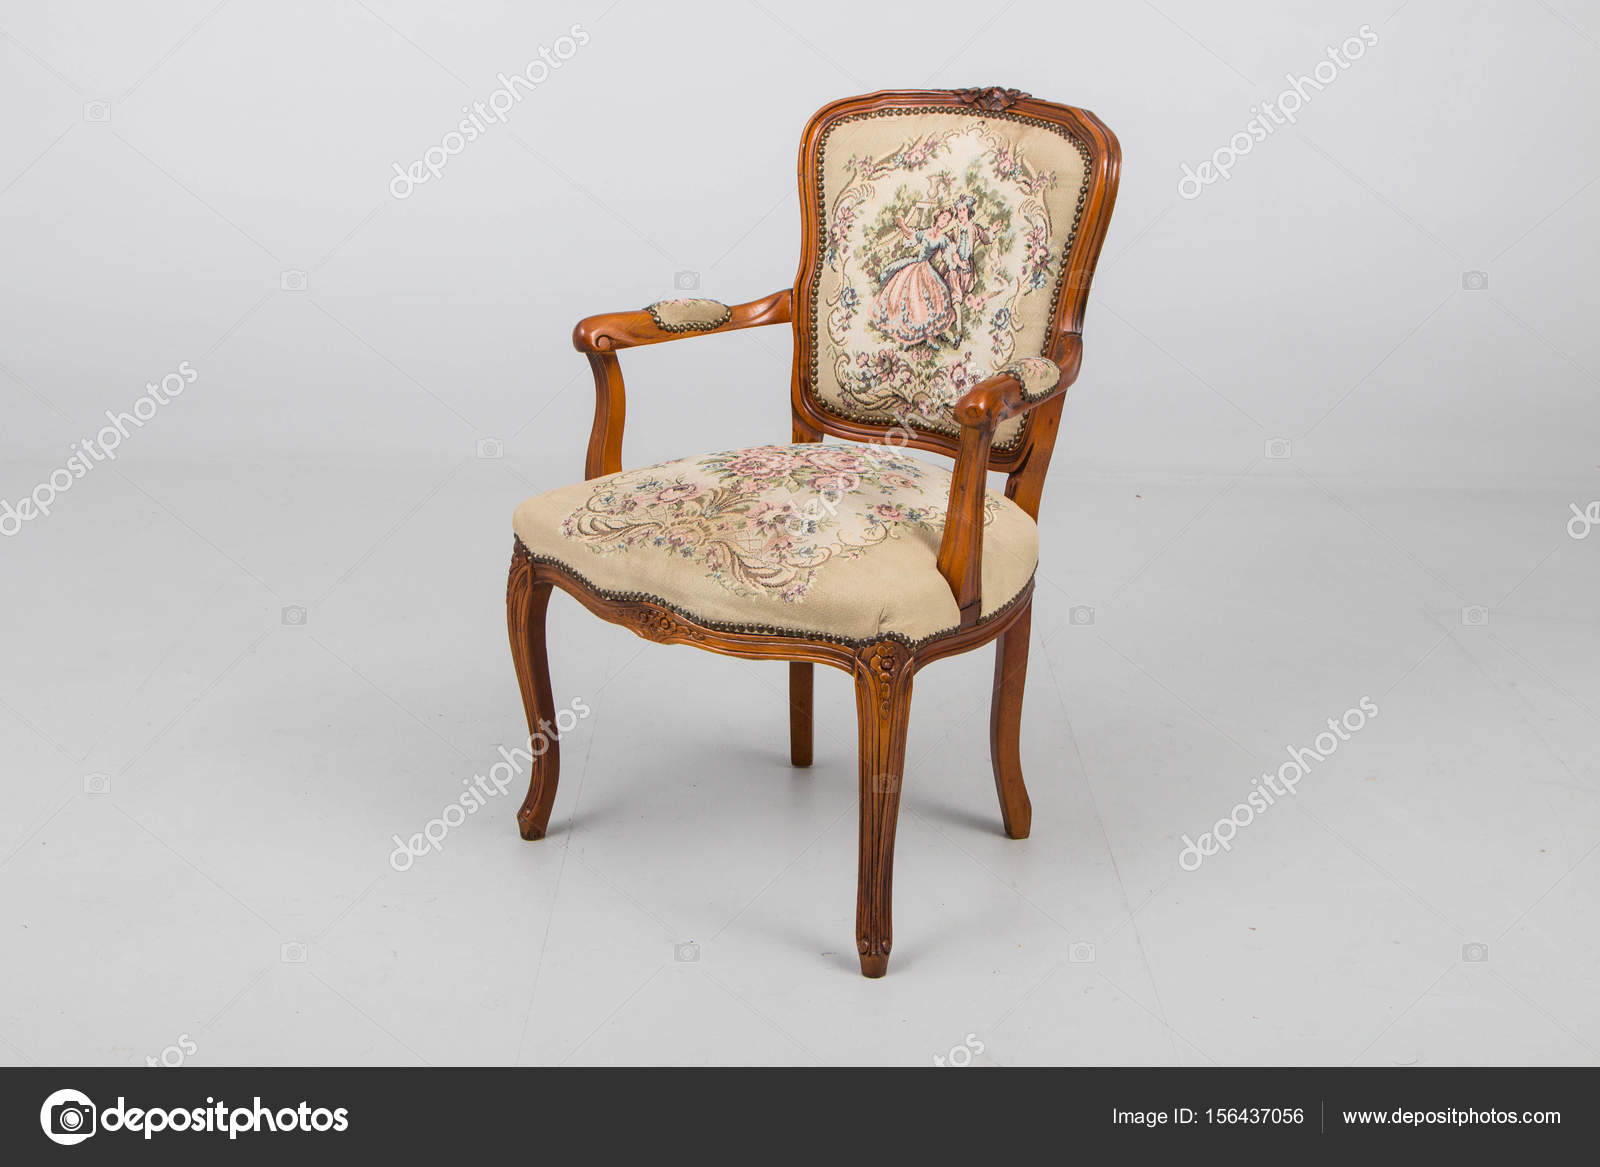 Sedie Poltrone Antiche.Sedie Poltrone Antiche Foto Stock C Jbgroup 156437056